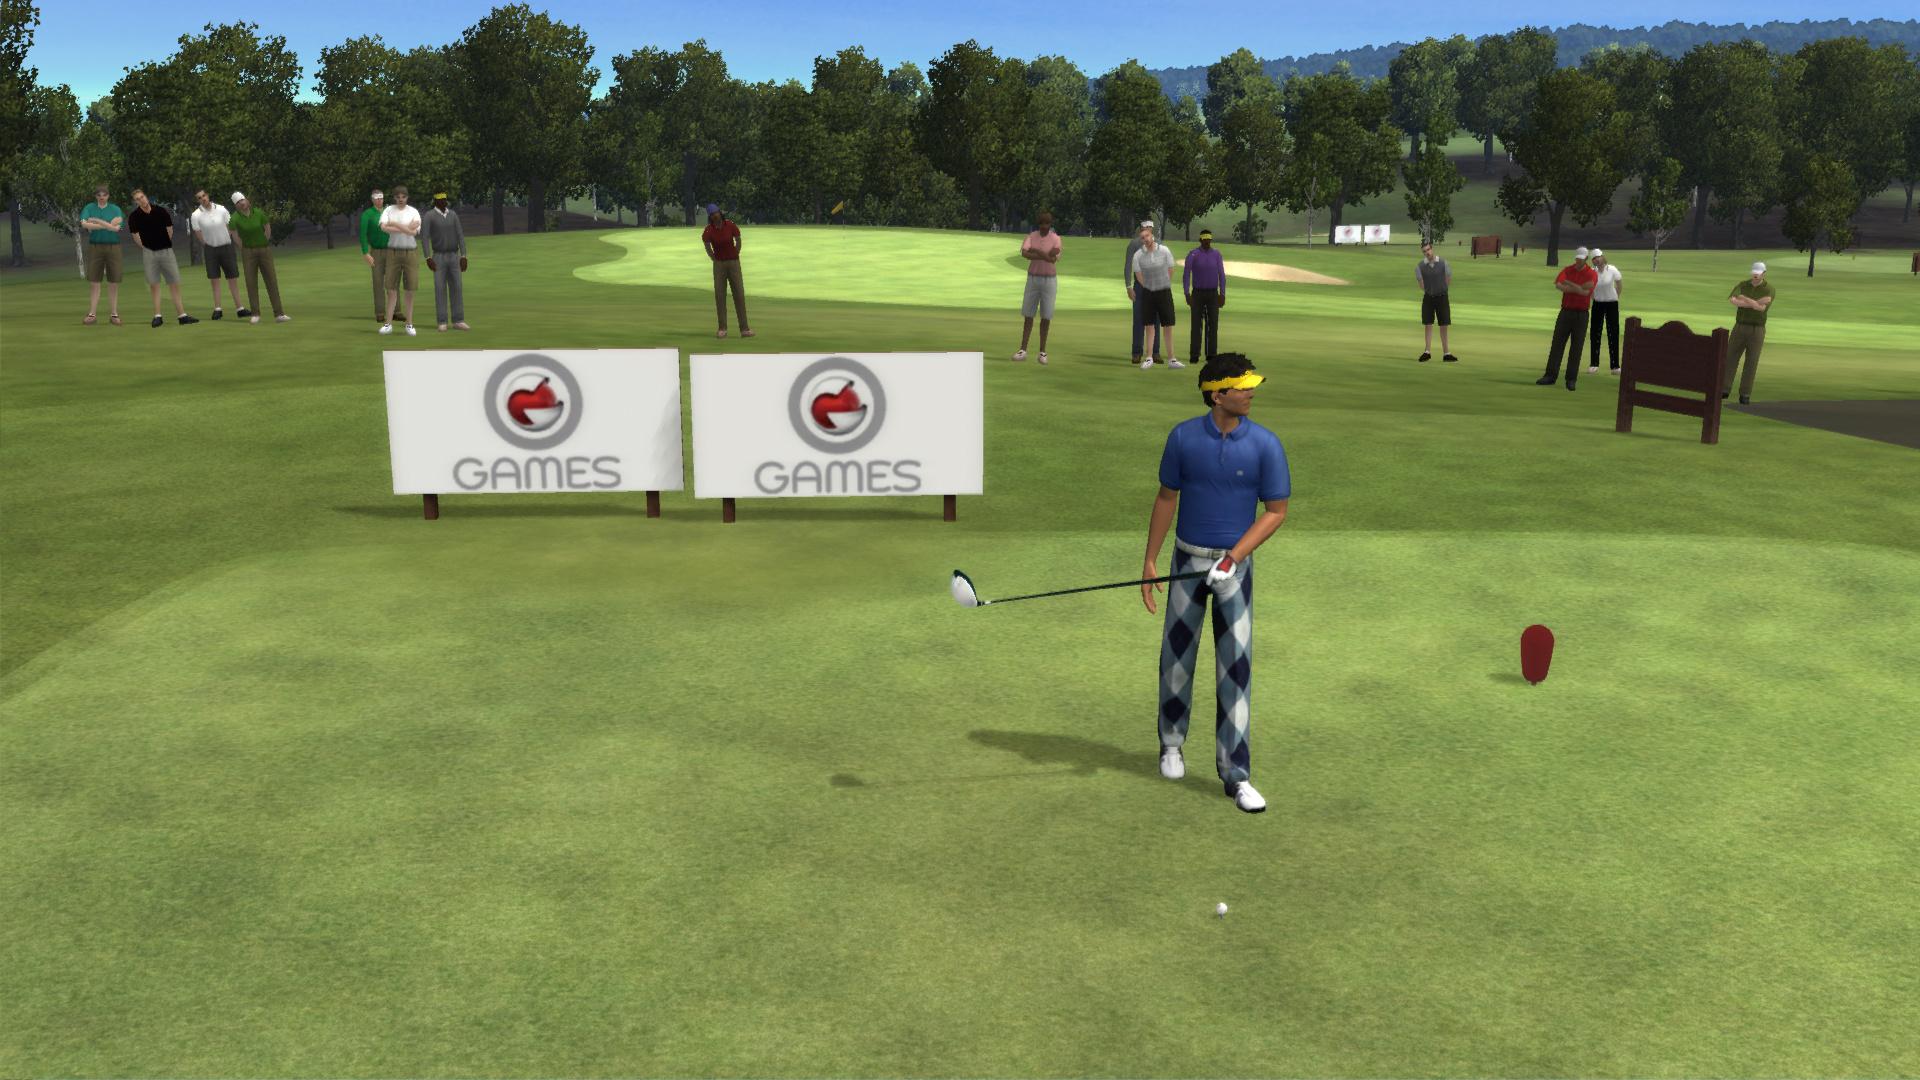 golf 3 games